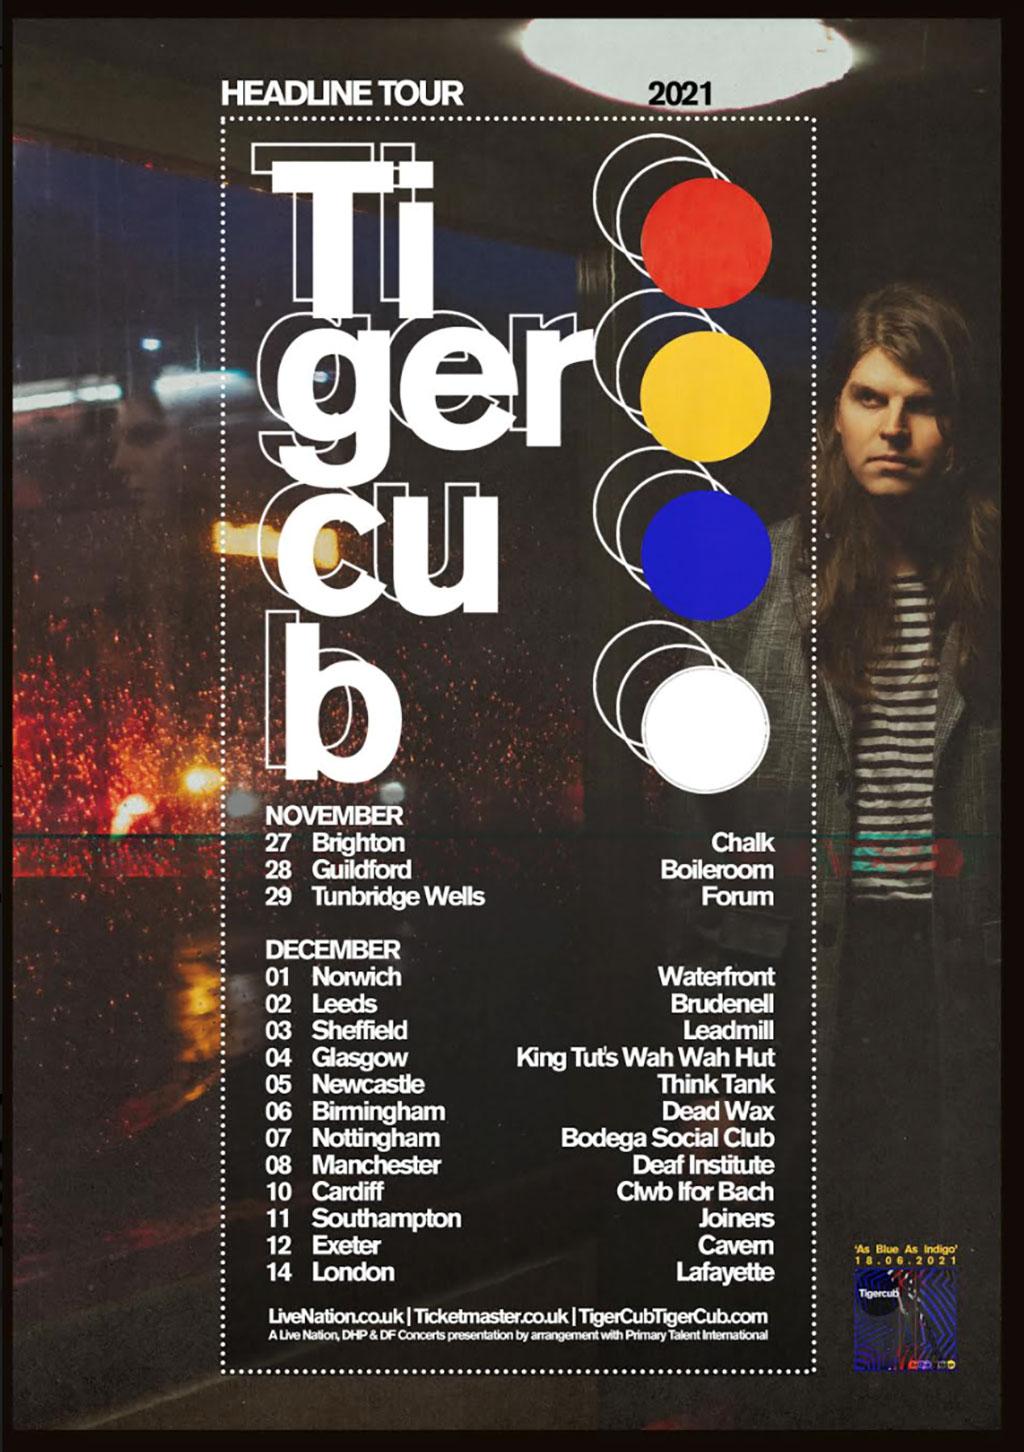 Tigercub - Headline Tour 2021